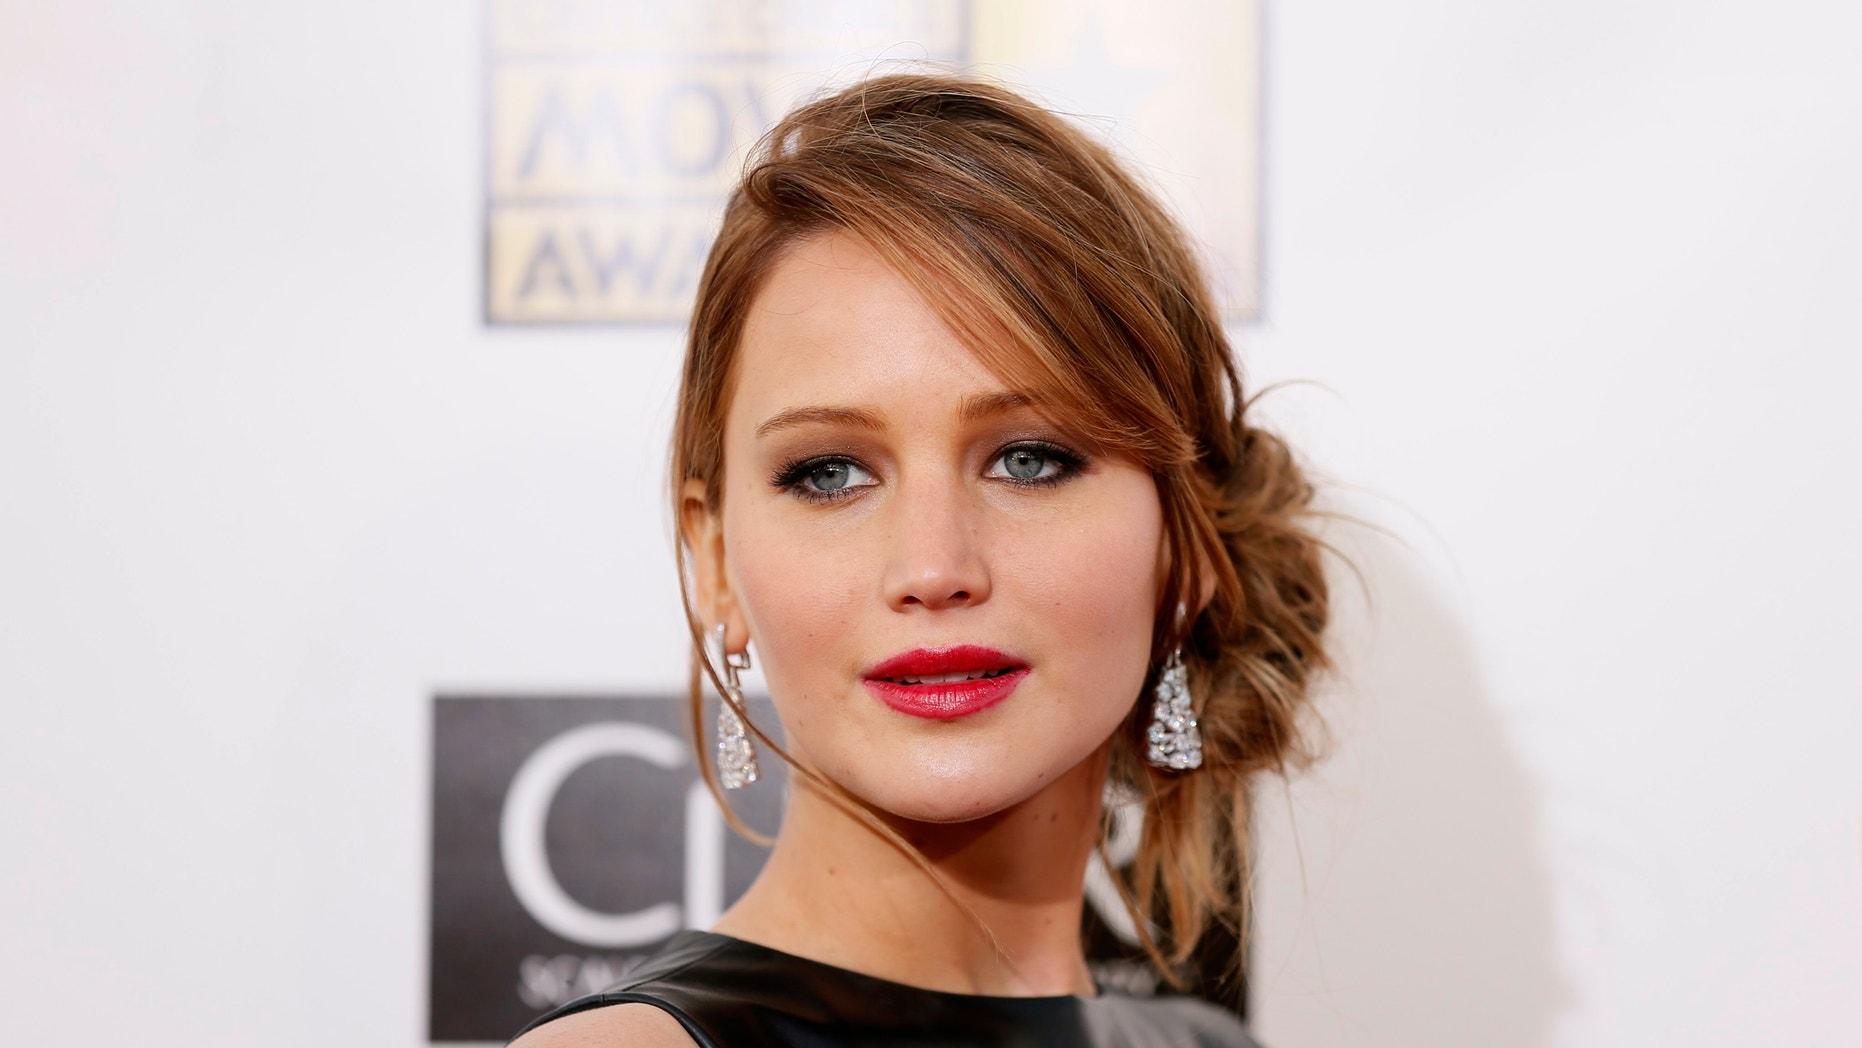 Jennifer Lawrence poses on arrival at the 2013 Critics' Choice Awards in Santa Monica, California January 10, 2013.